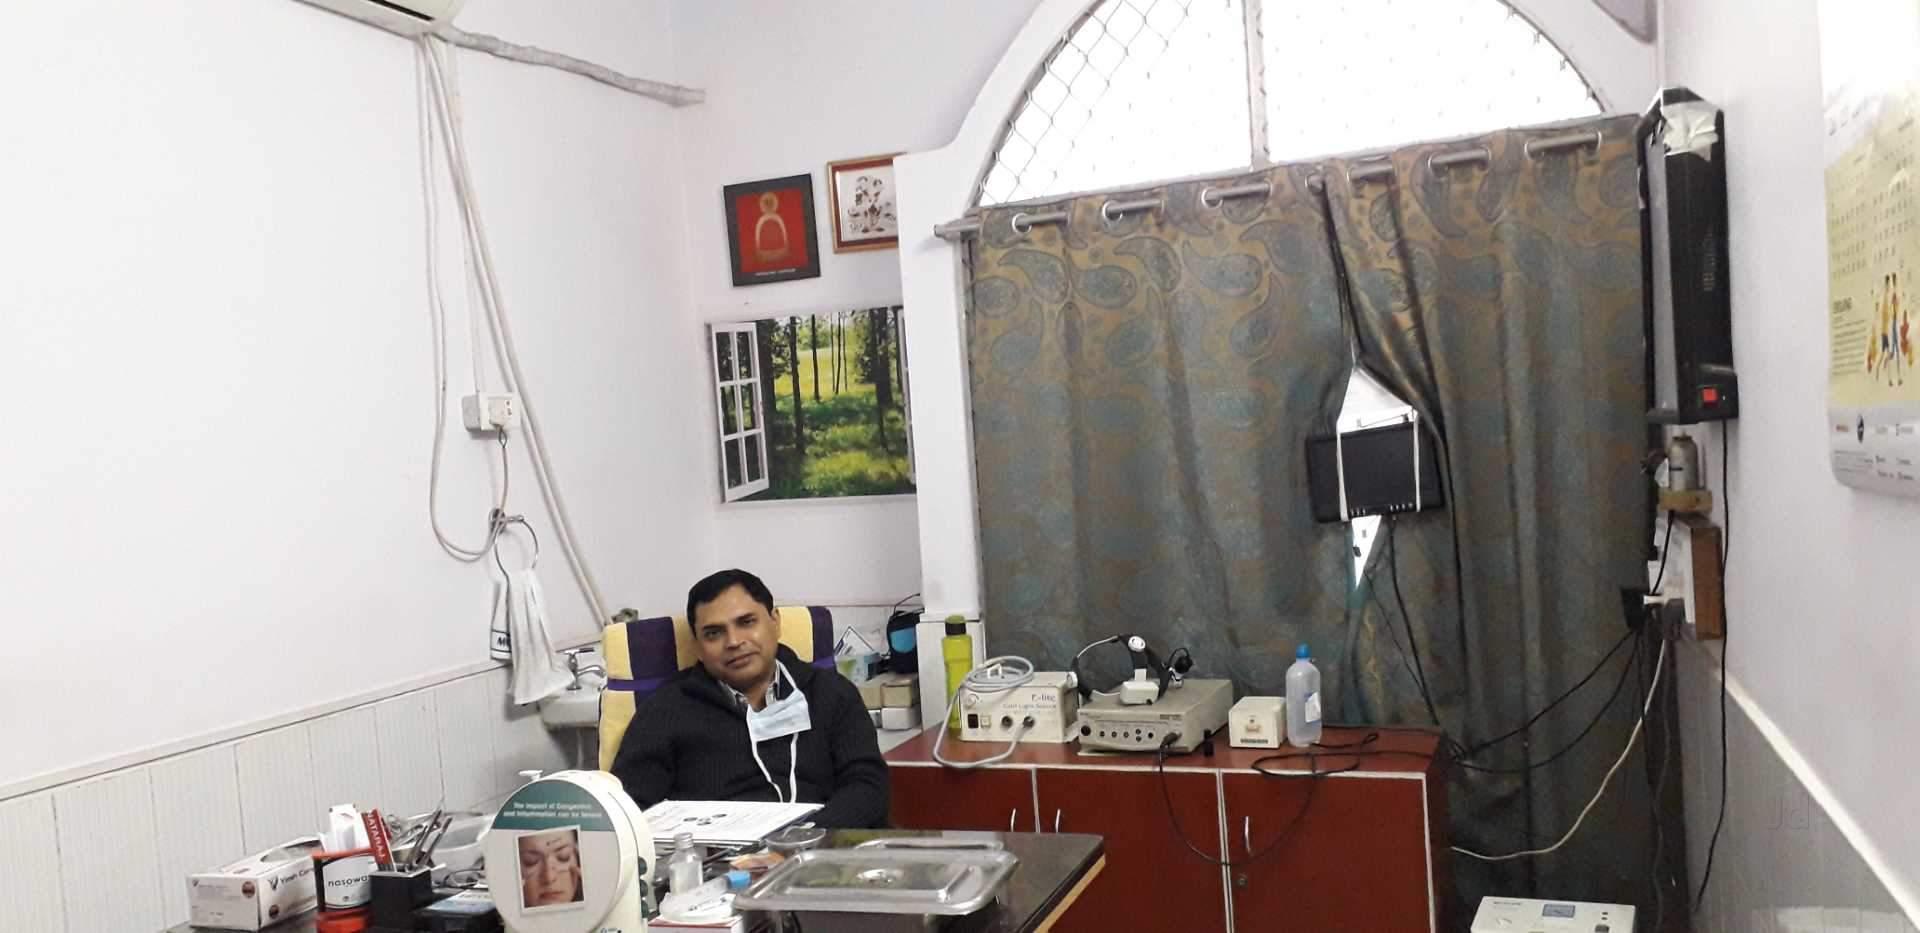 Top 10 ENT Doctors in Muzaffarpur - Best ENT Specialists - Book